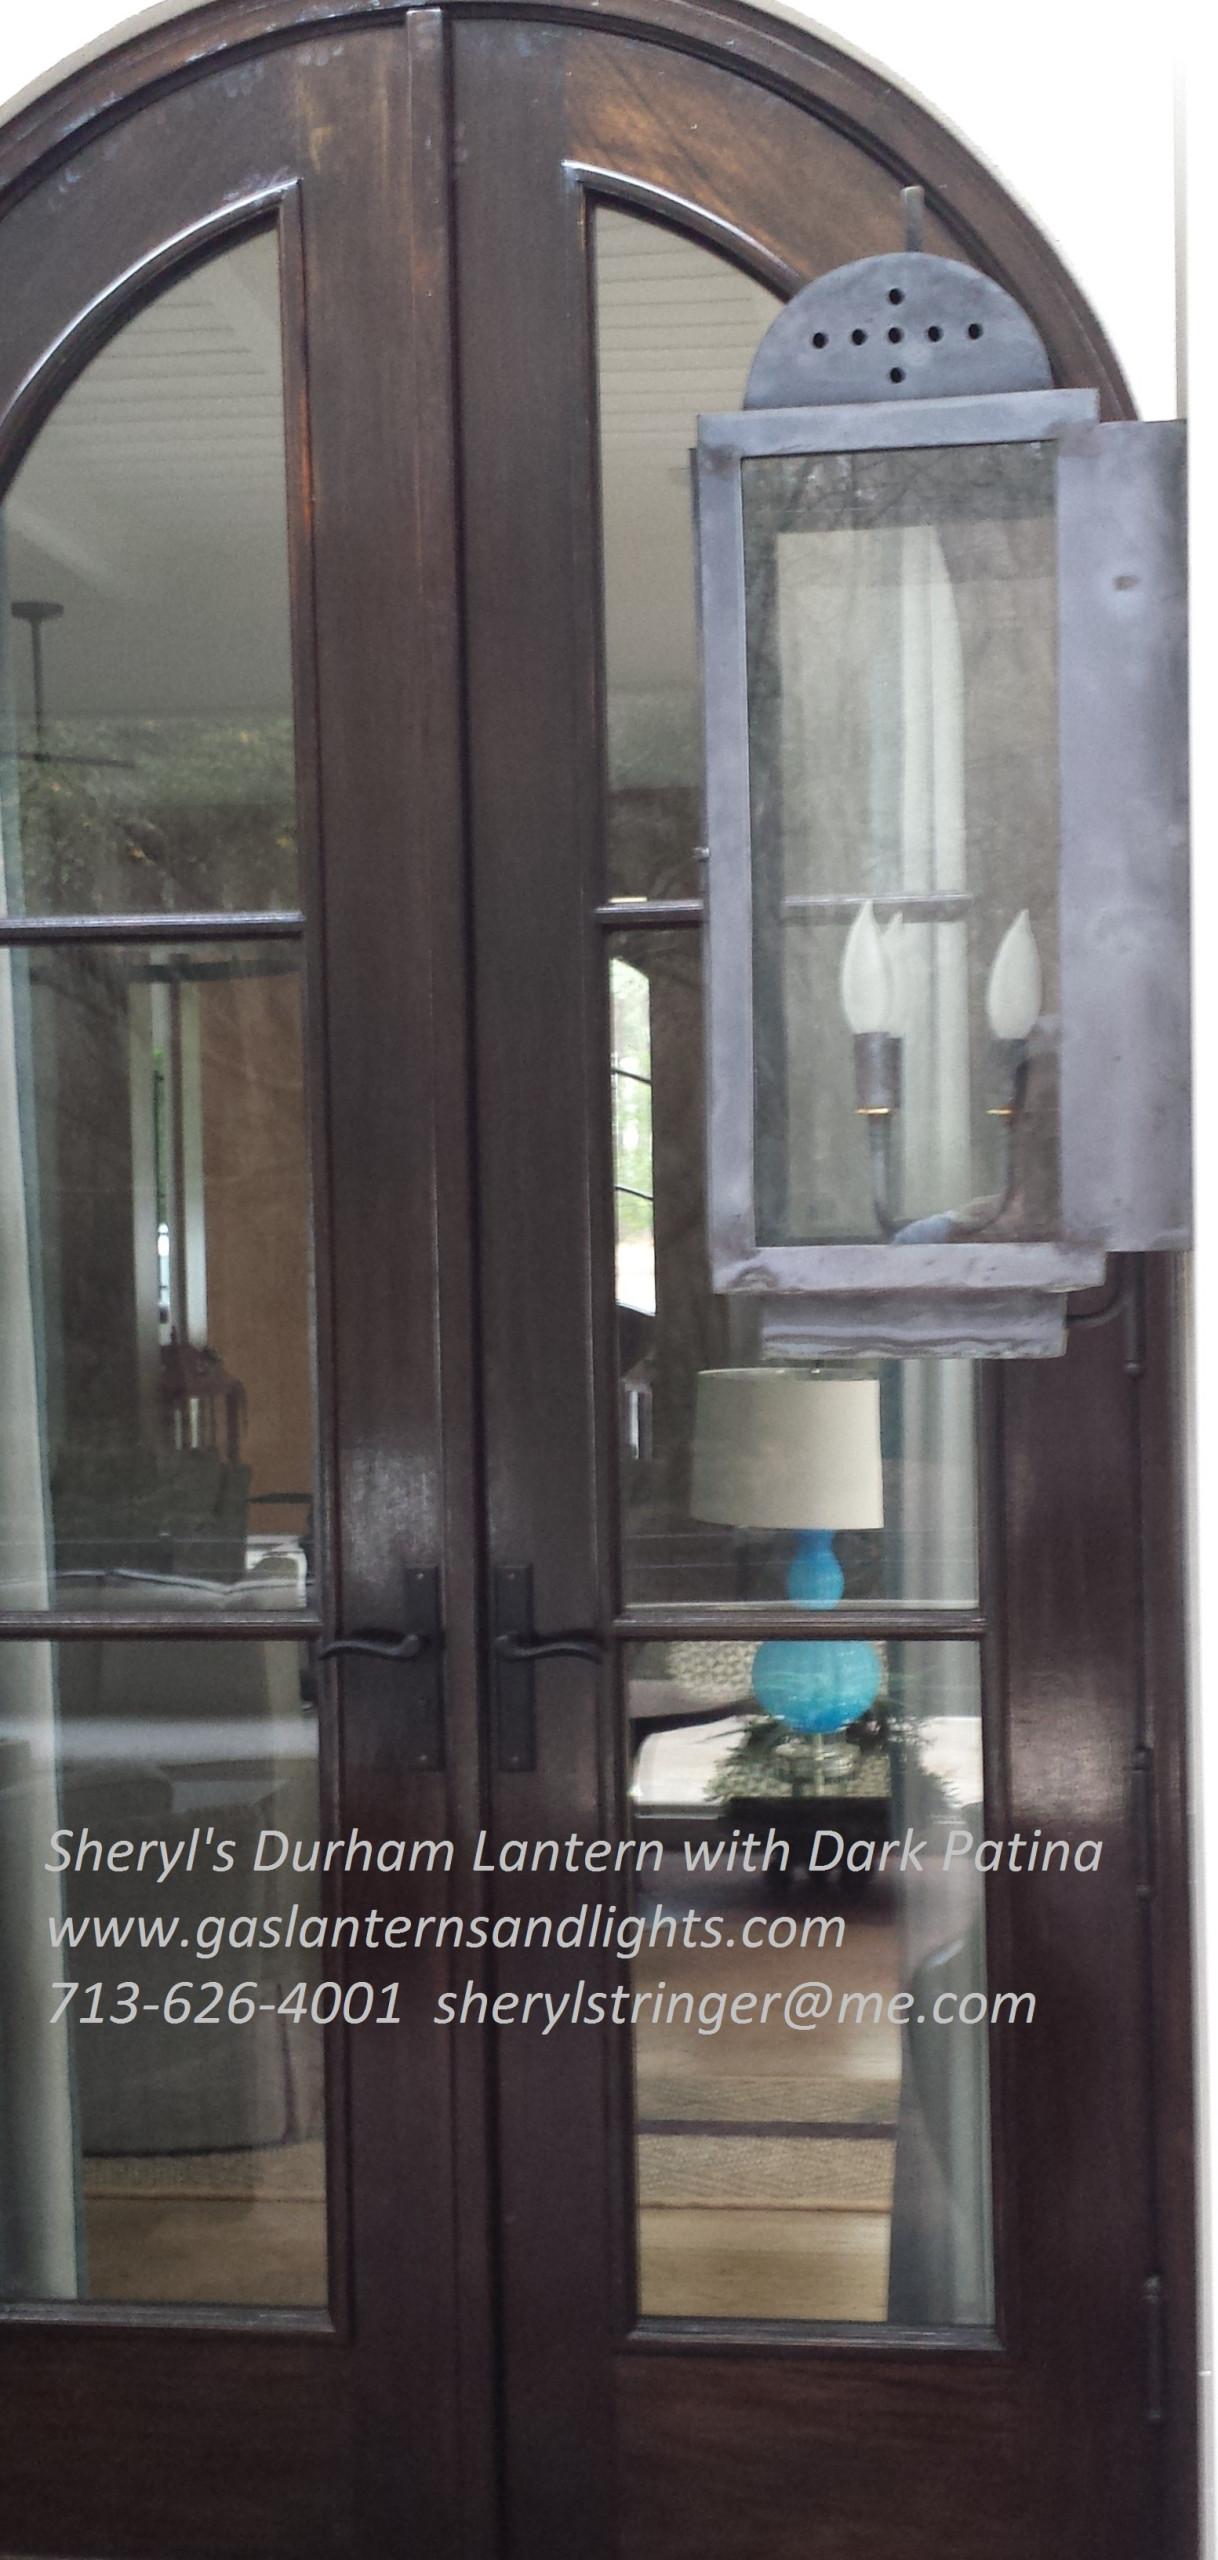 Electric Durham Lantern with Dark Patina Finish  by Sheryl Stringer